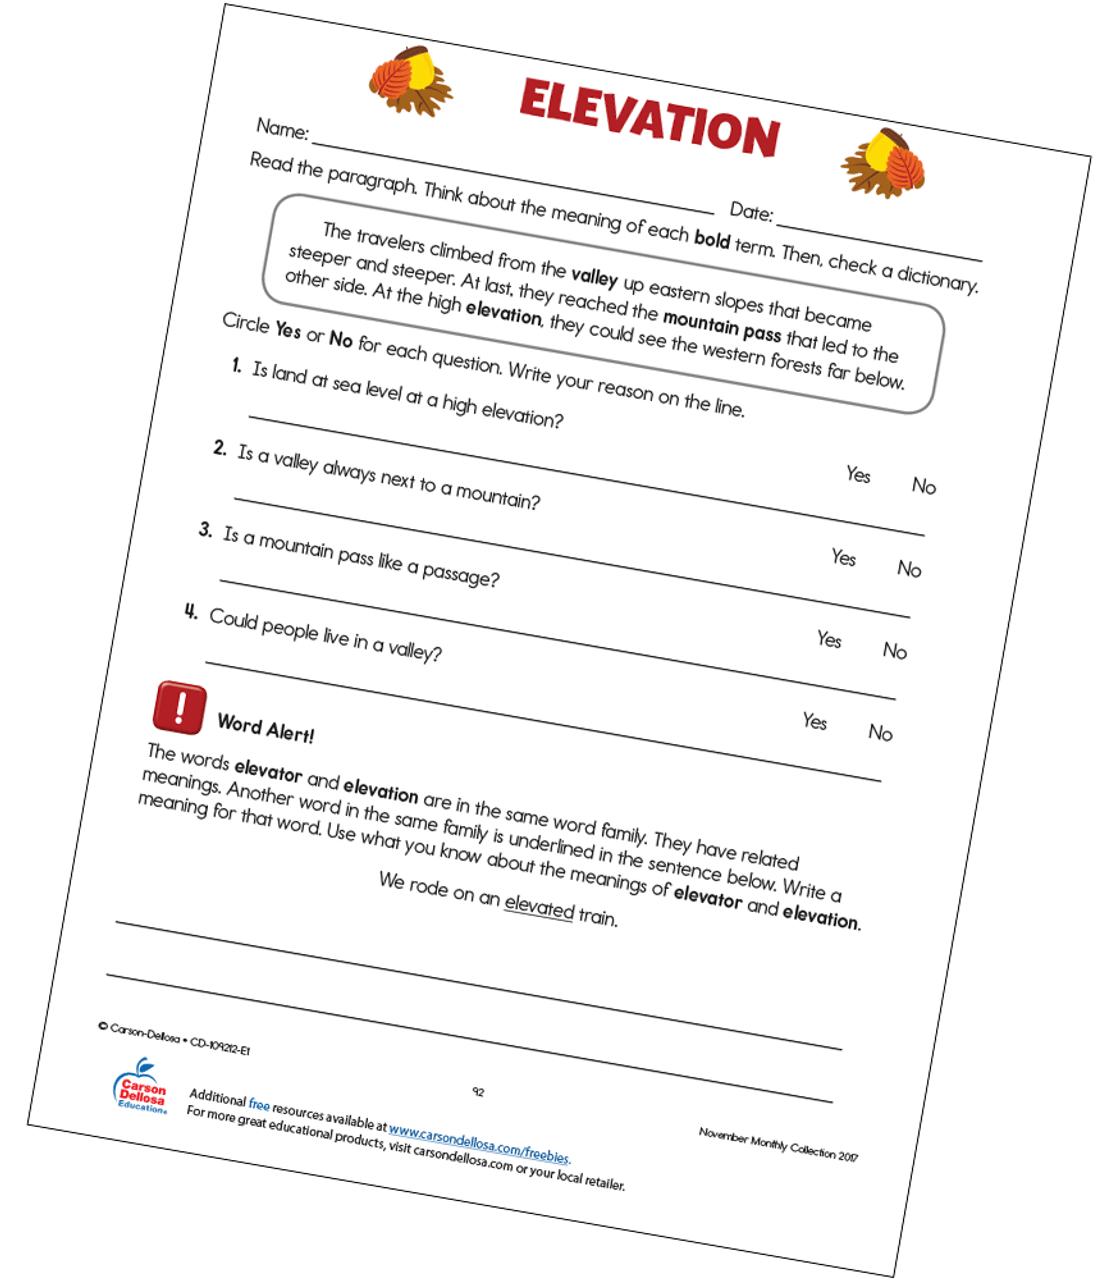 Elevation Free Printable   Carson Dellosa [ 1280 x 1120 Pixel ]